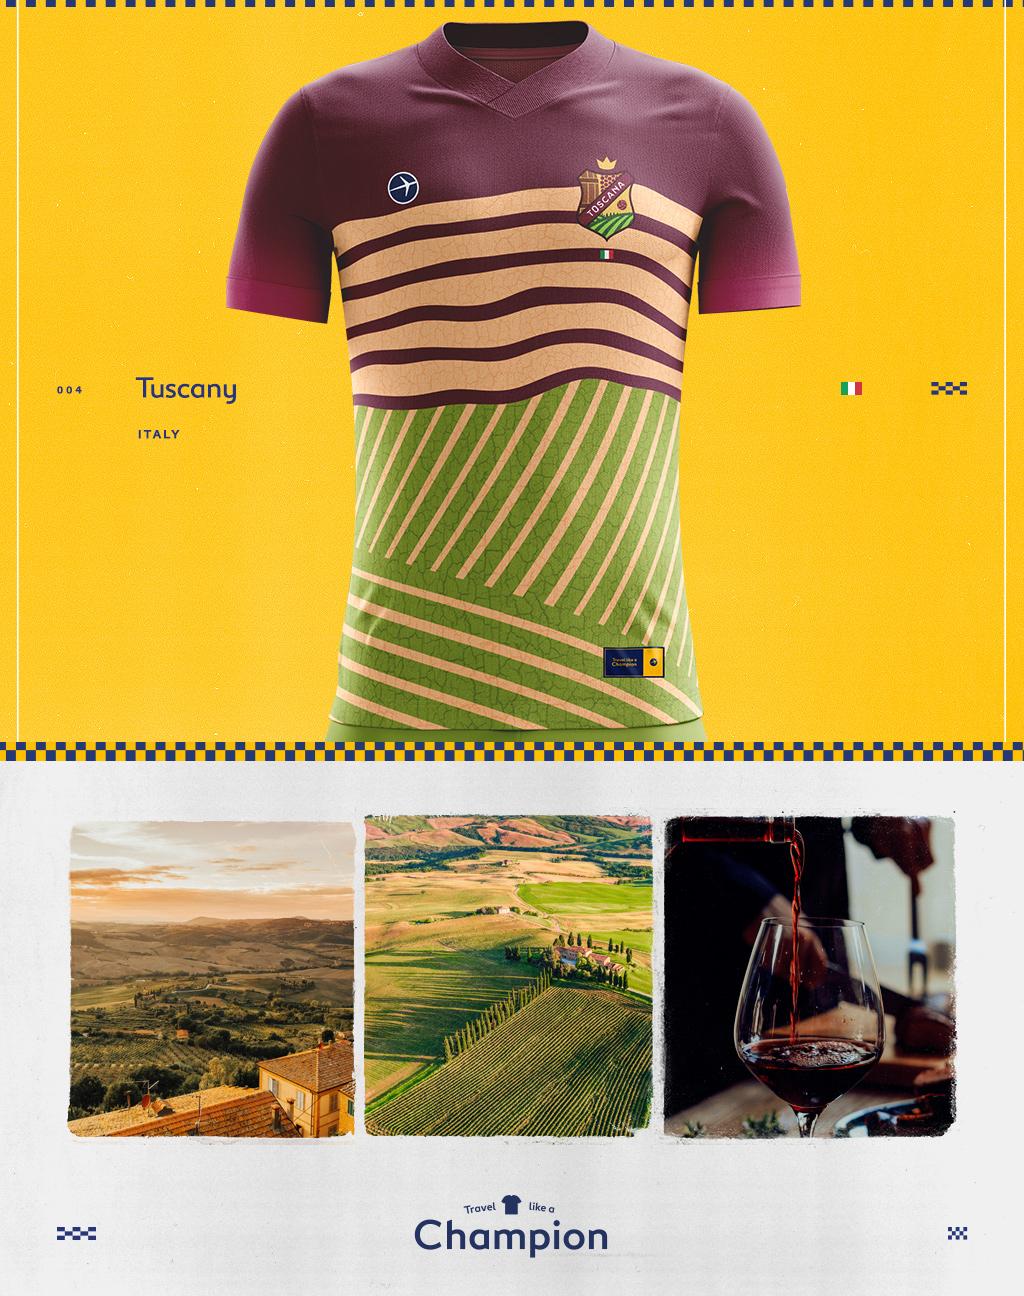 004-toscana-blog-article-1024x1296-uk.jpg?1555974485